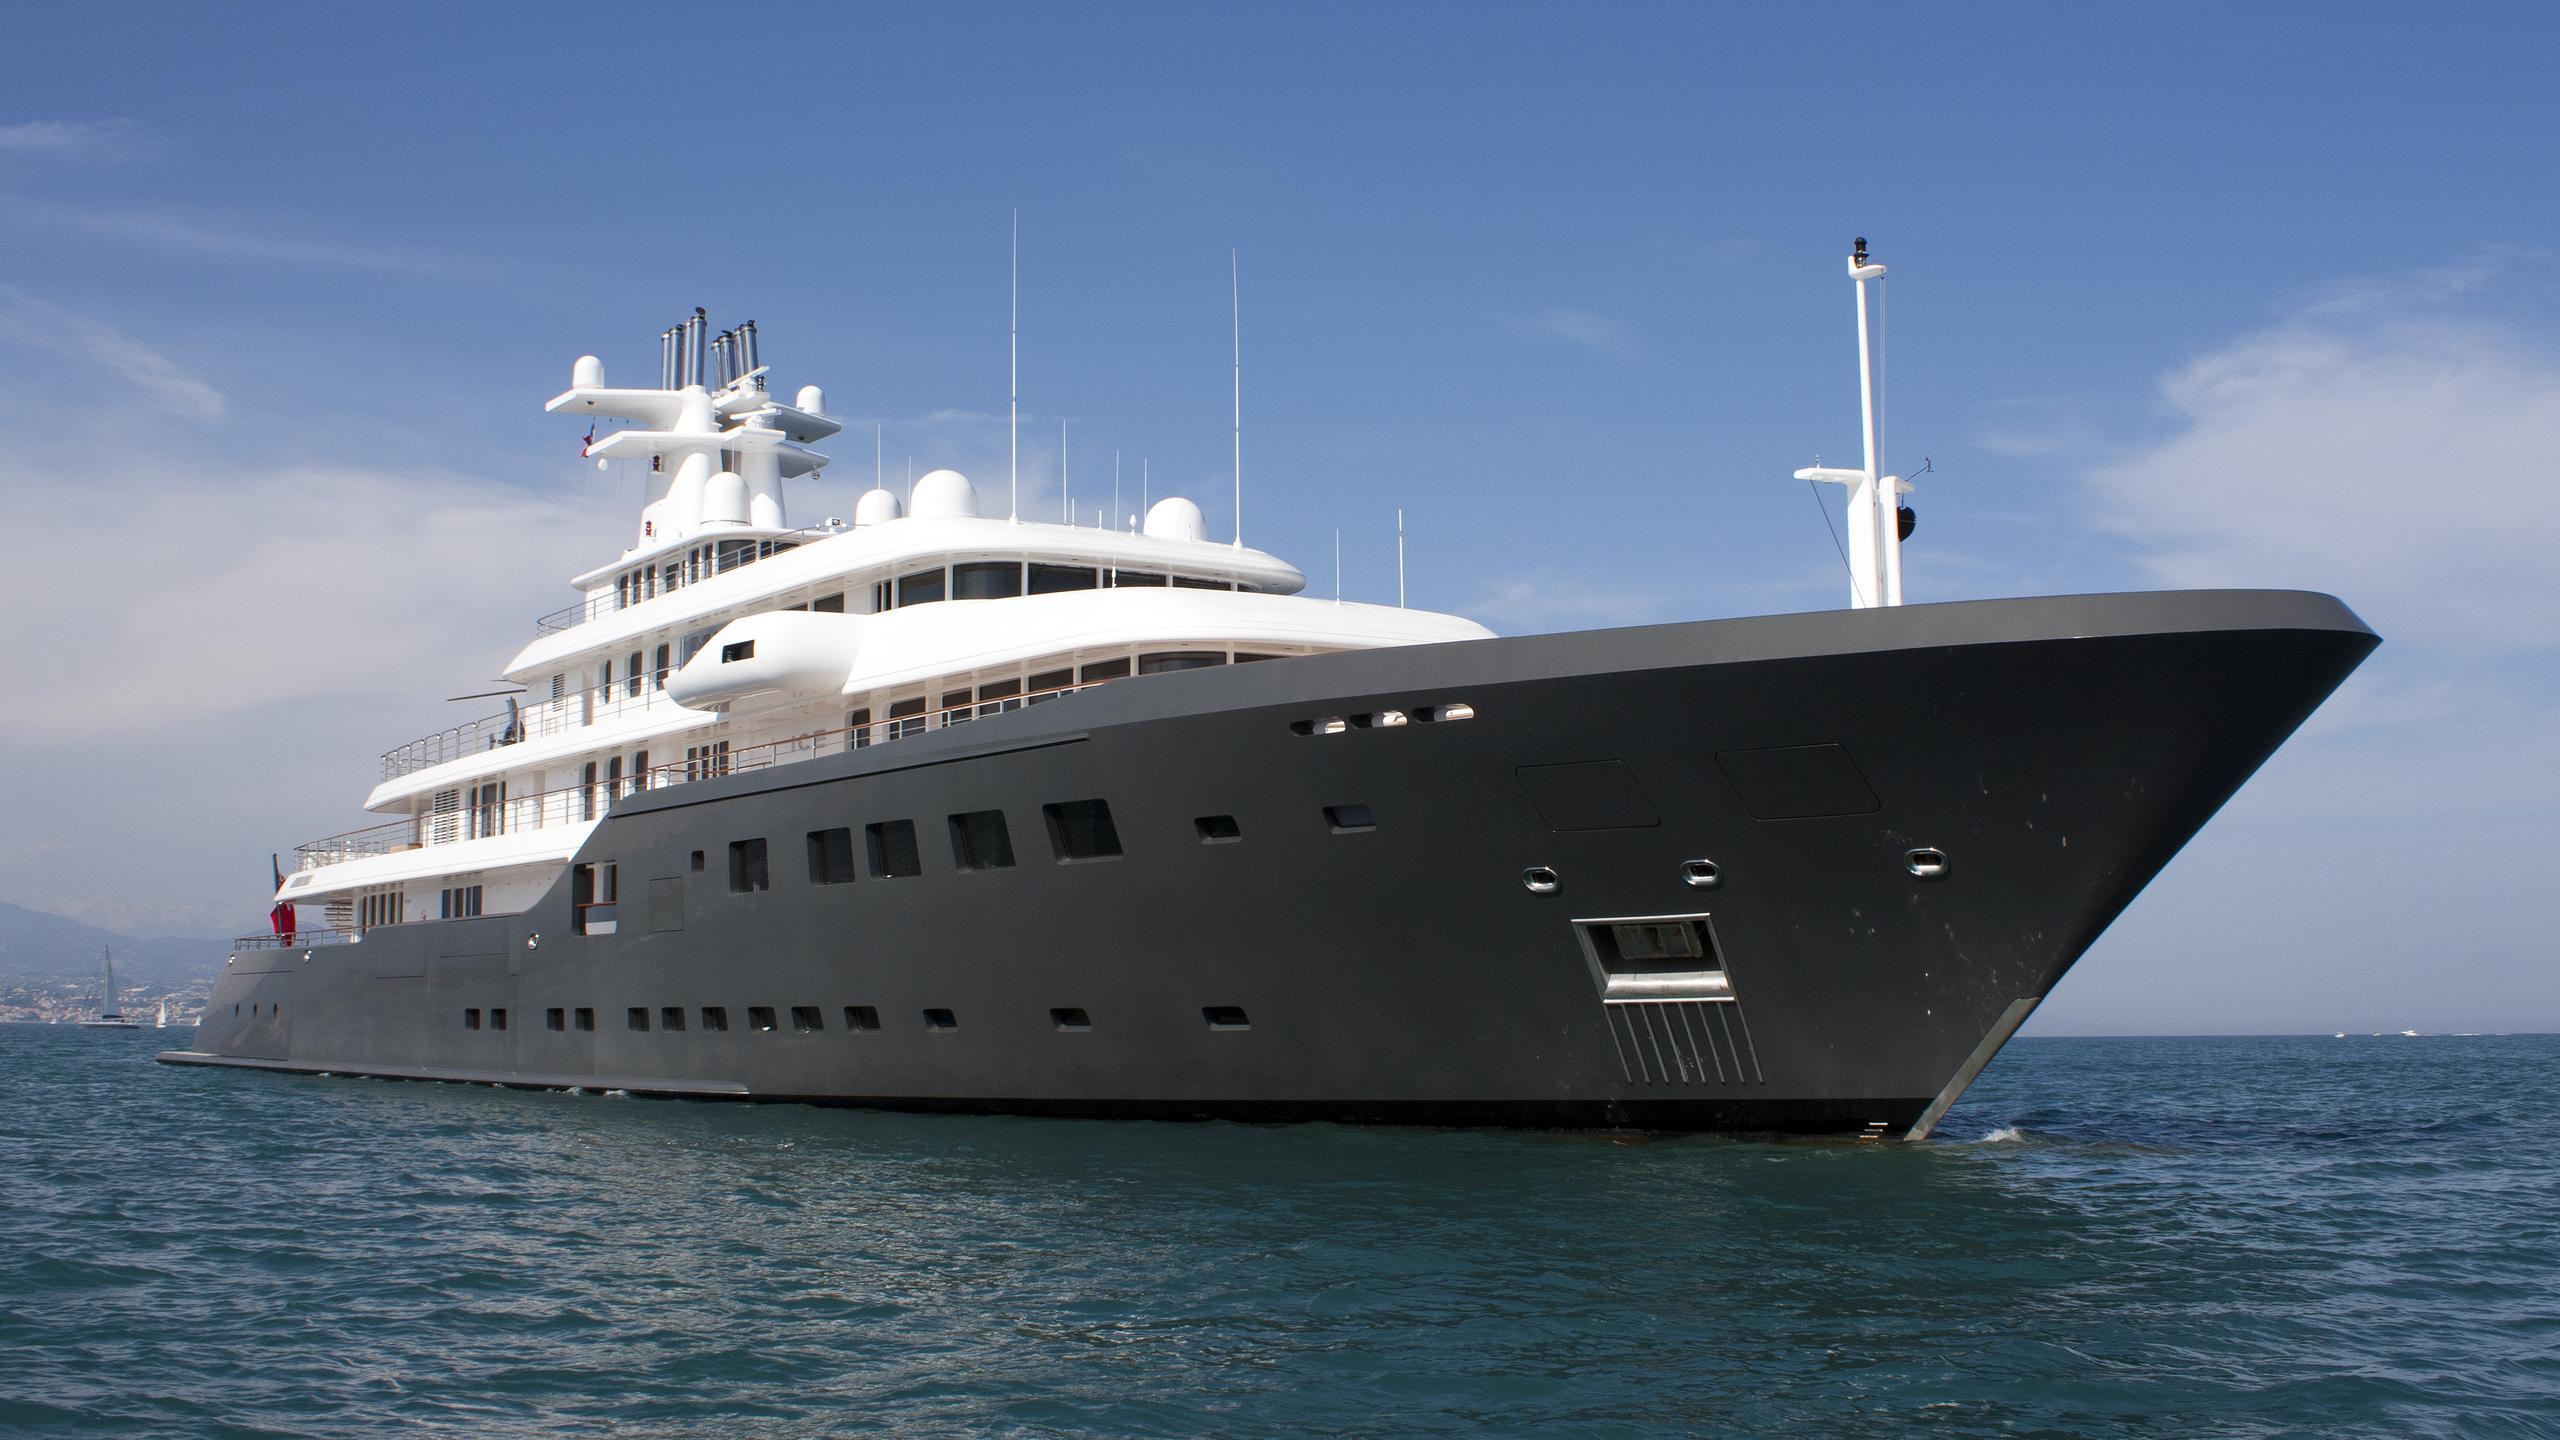 ice-explorer-yacht-lurssen-2005-90m-half-profile